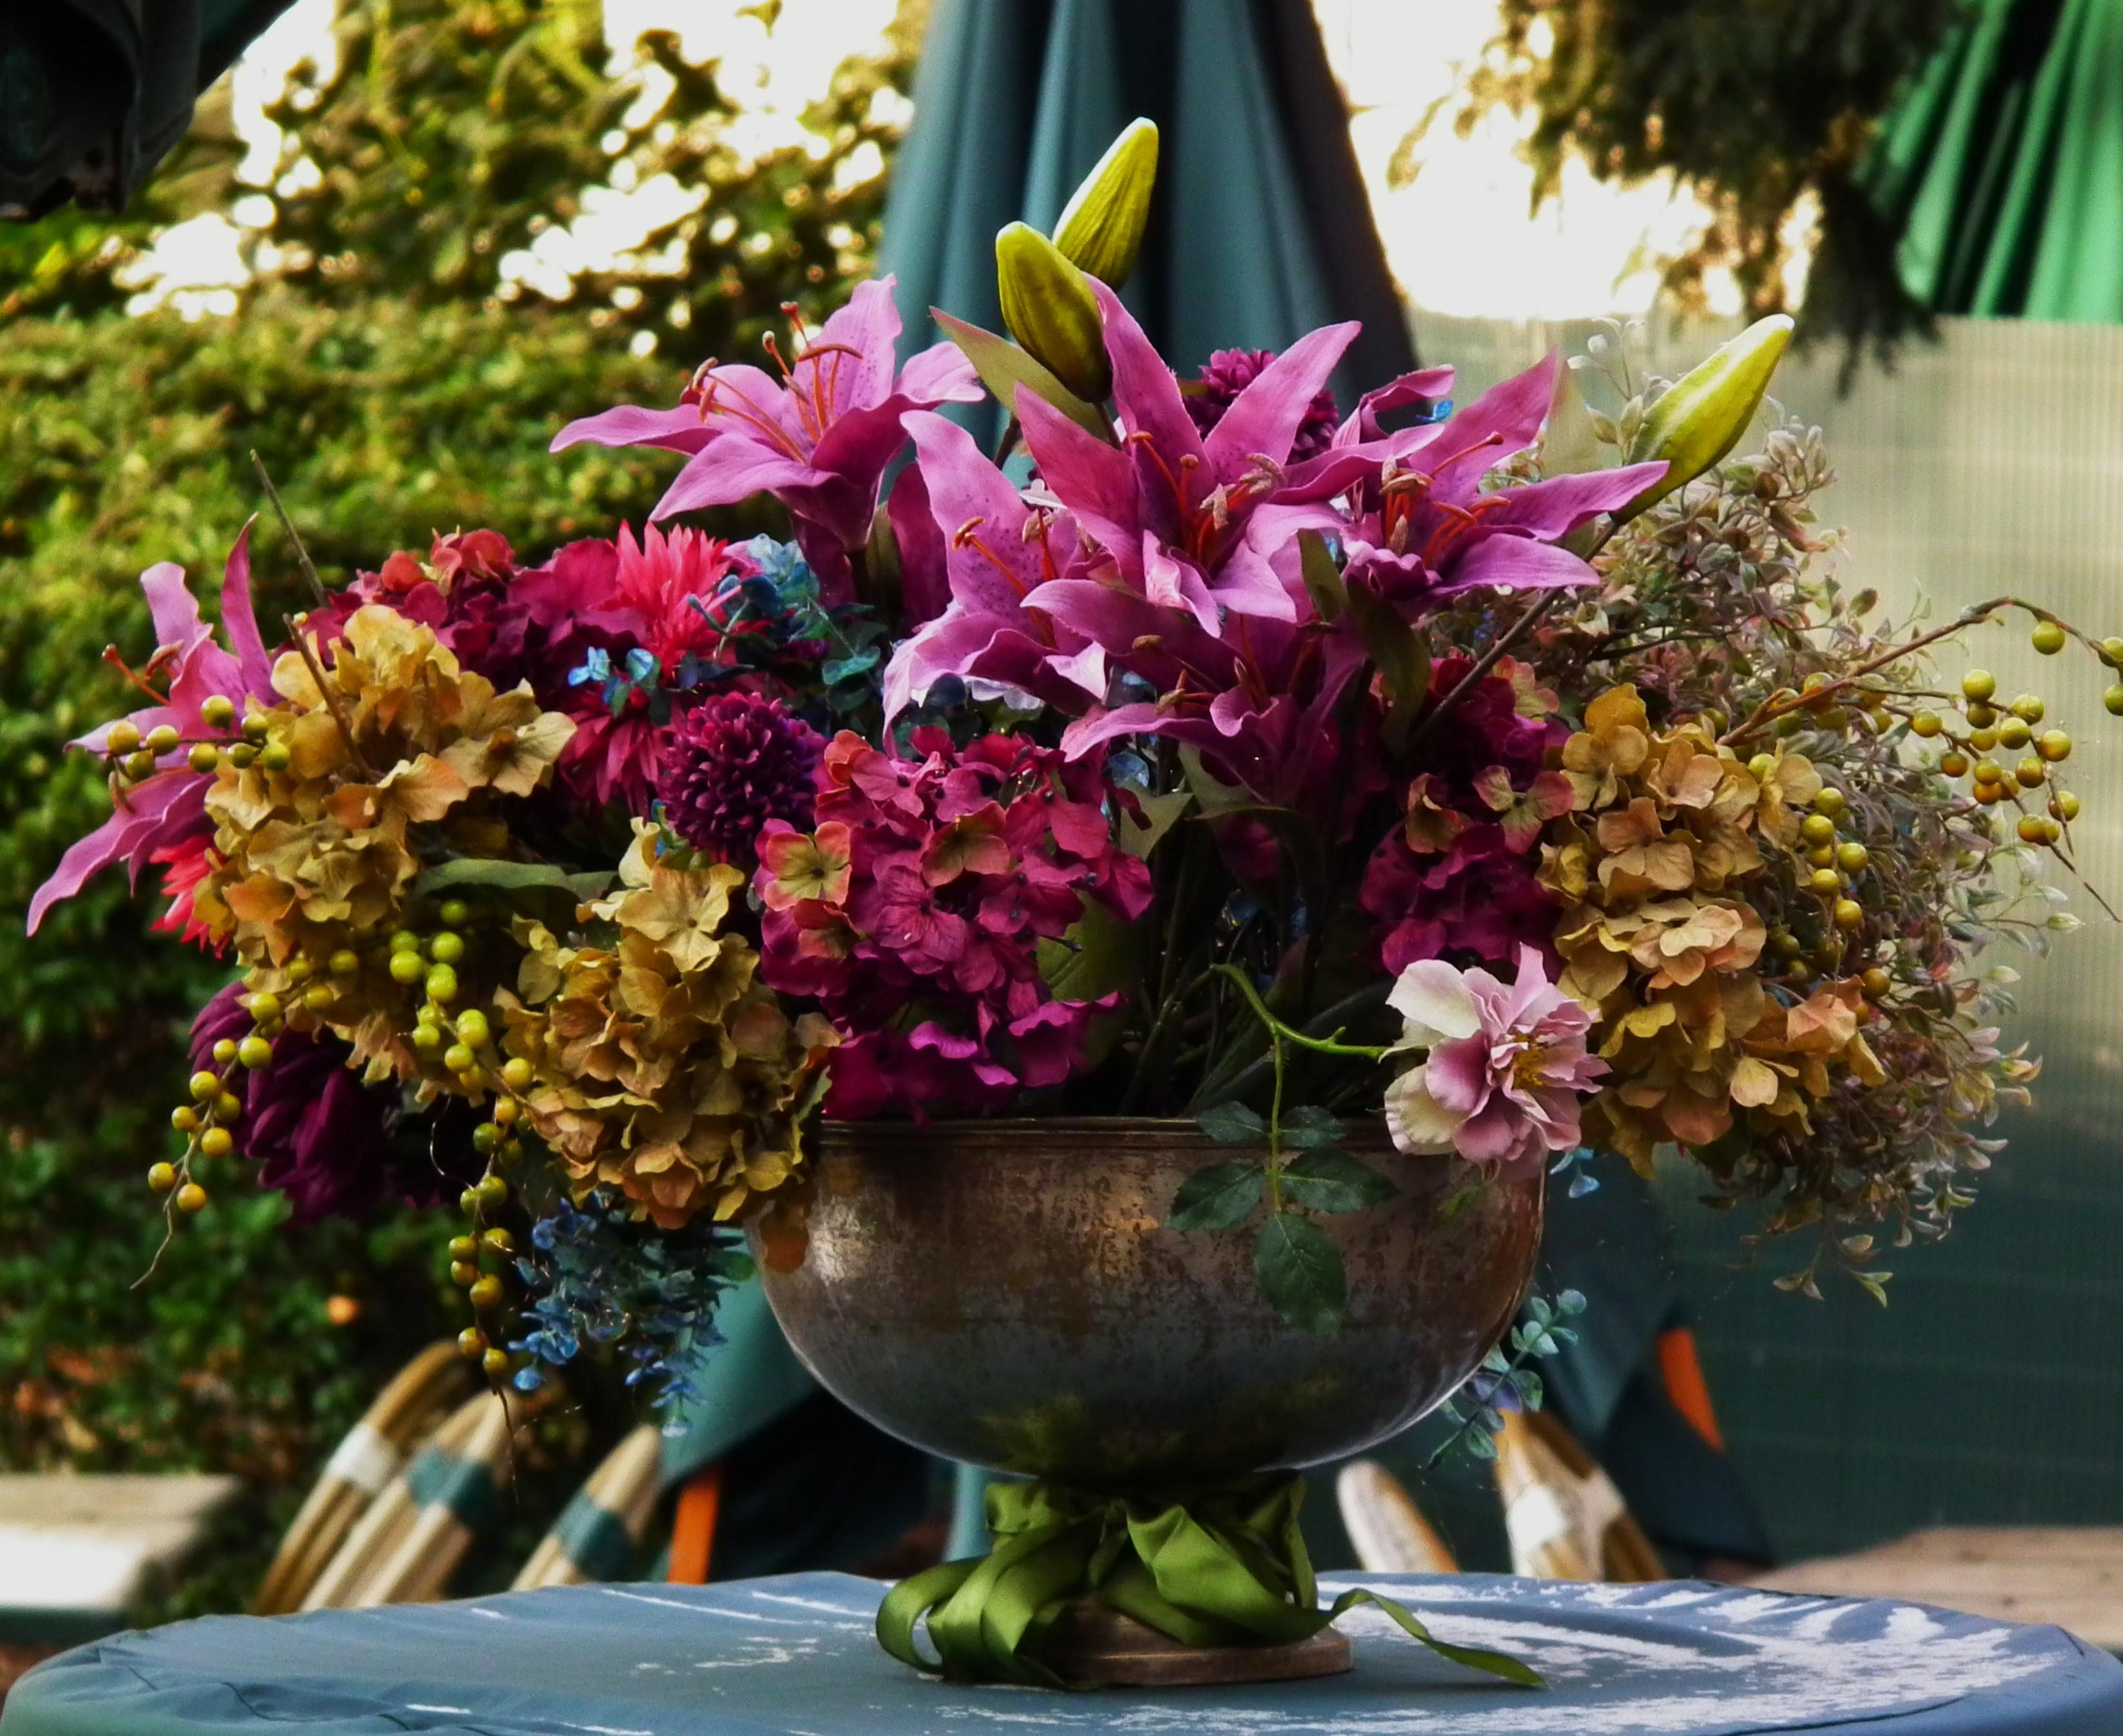 Pin Blumendekoration Hortensien Lilien Hd 2012jpg